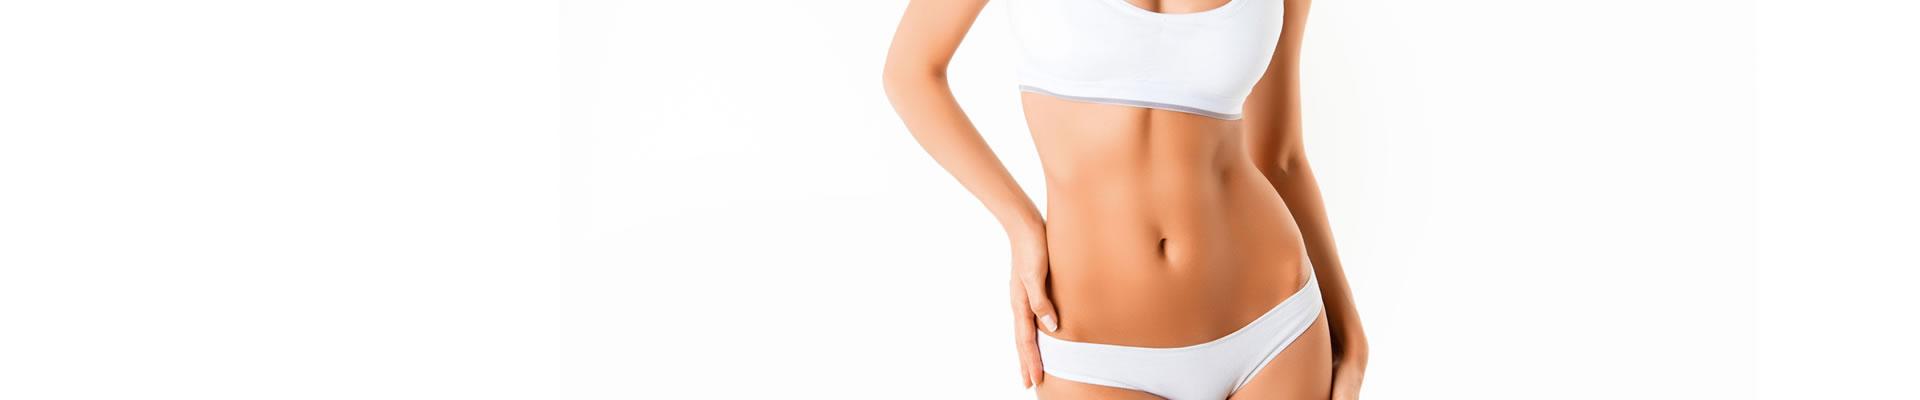 Body-surgery-mittal-patel